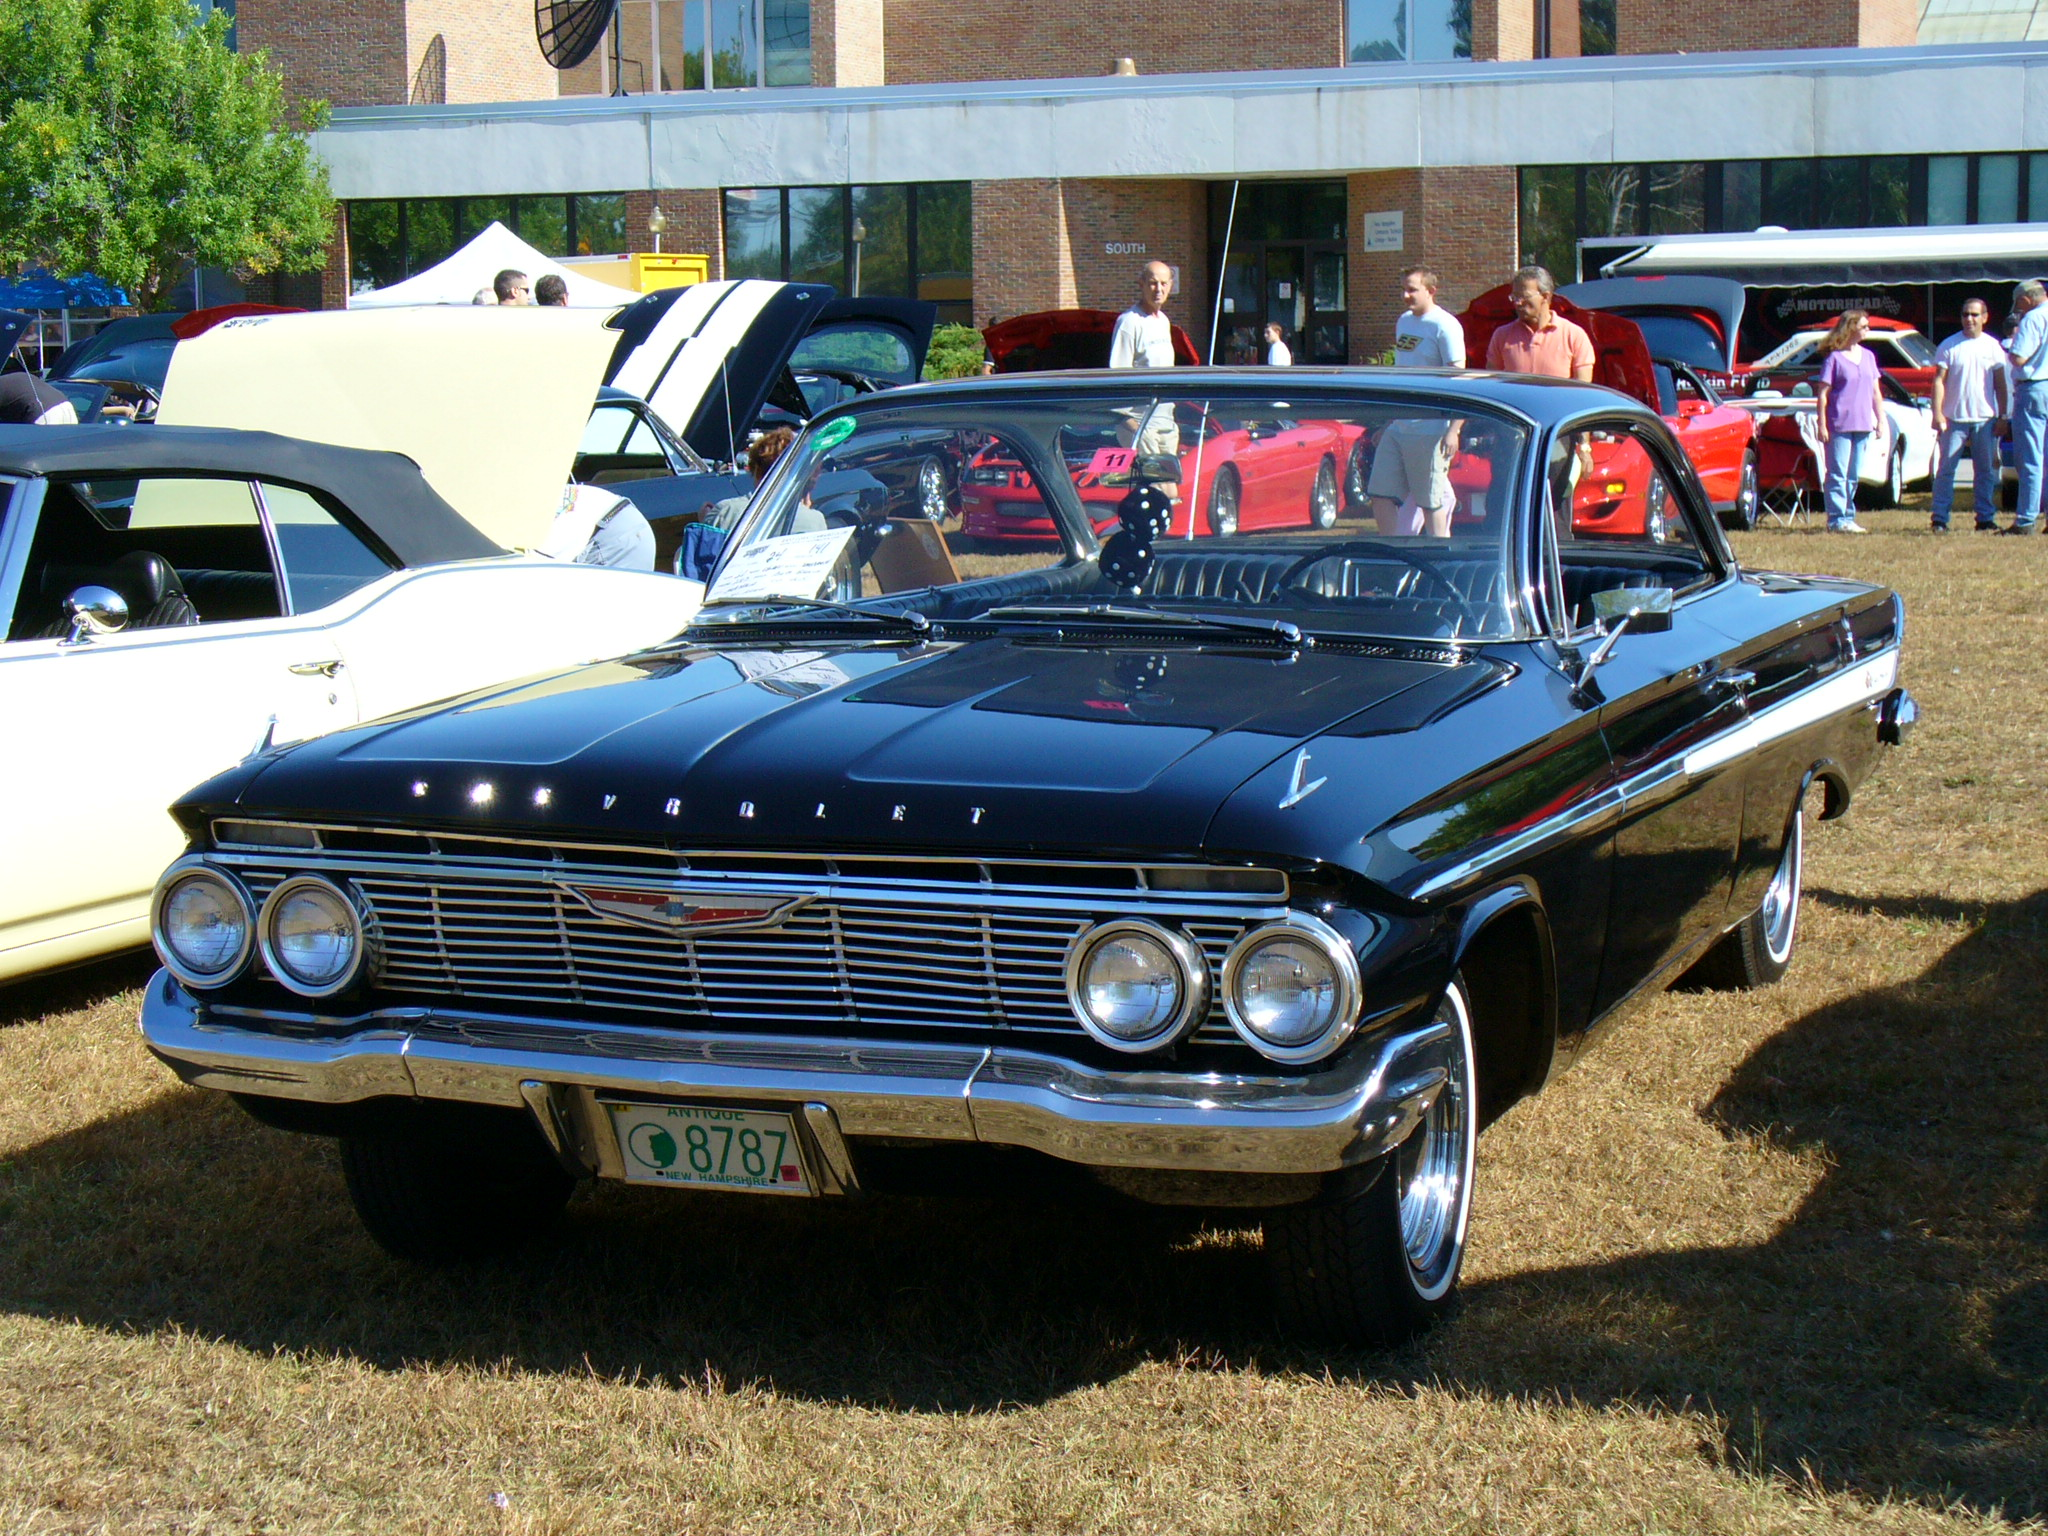 Classic Chevy Impala